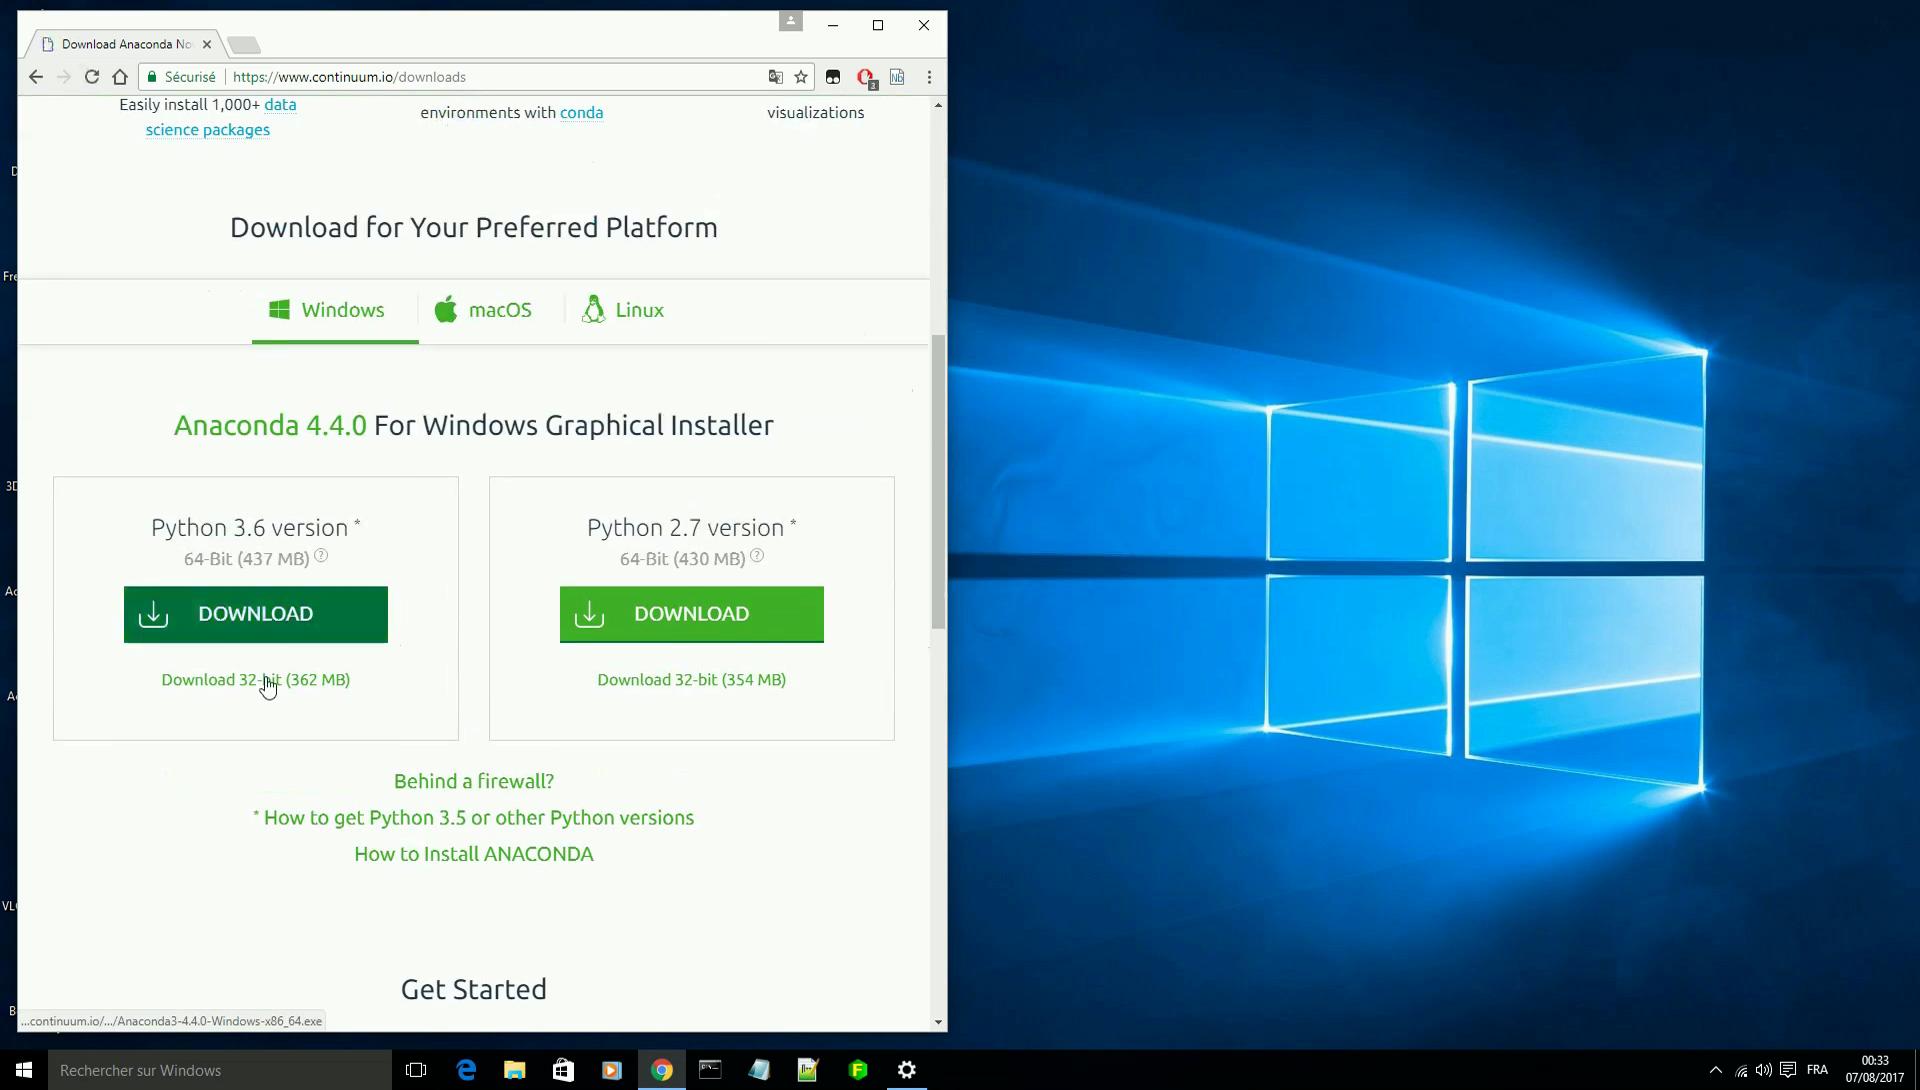 Vidéo Annexe 1 : Jupyter : installer Anaconda Windows 10 — Documentation